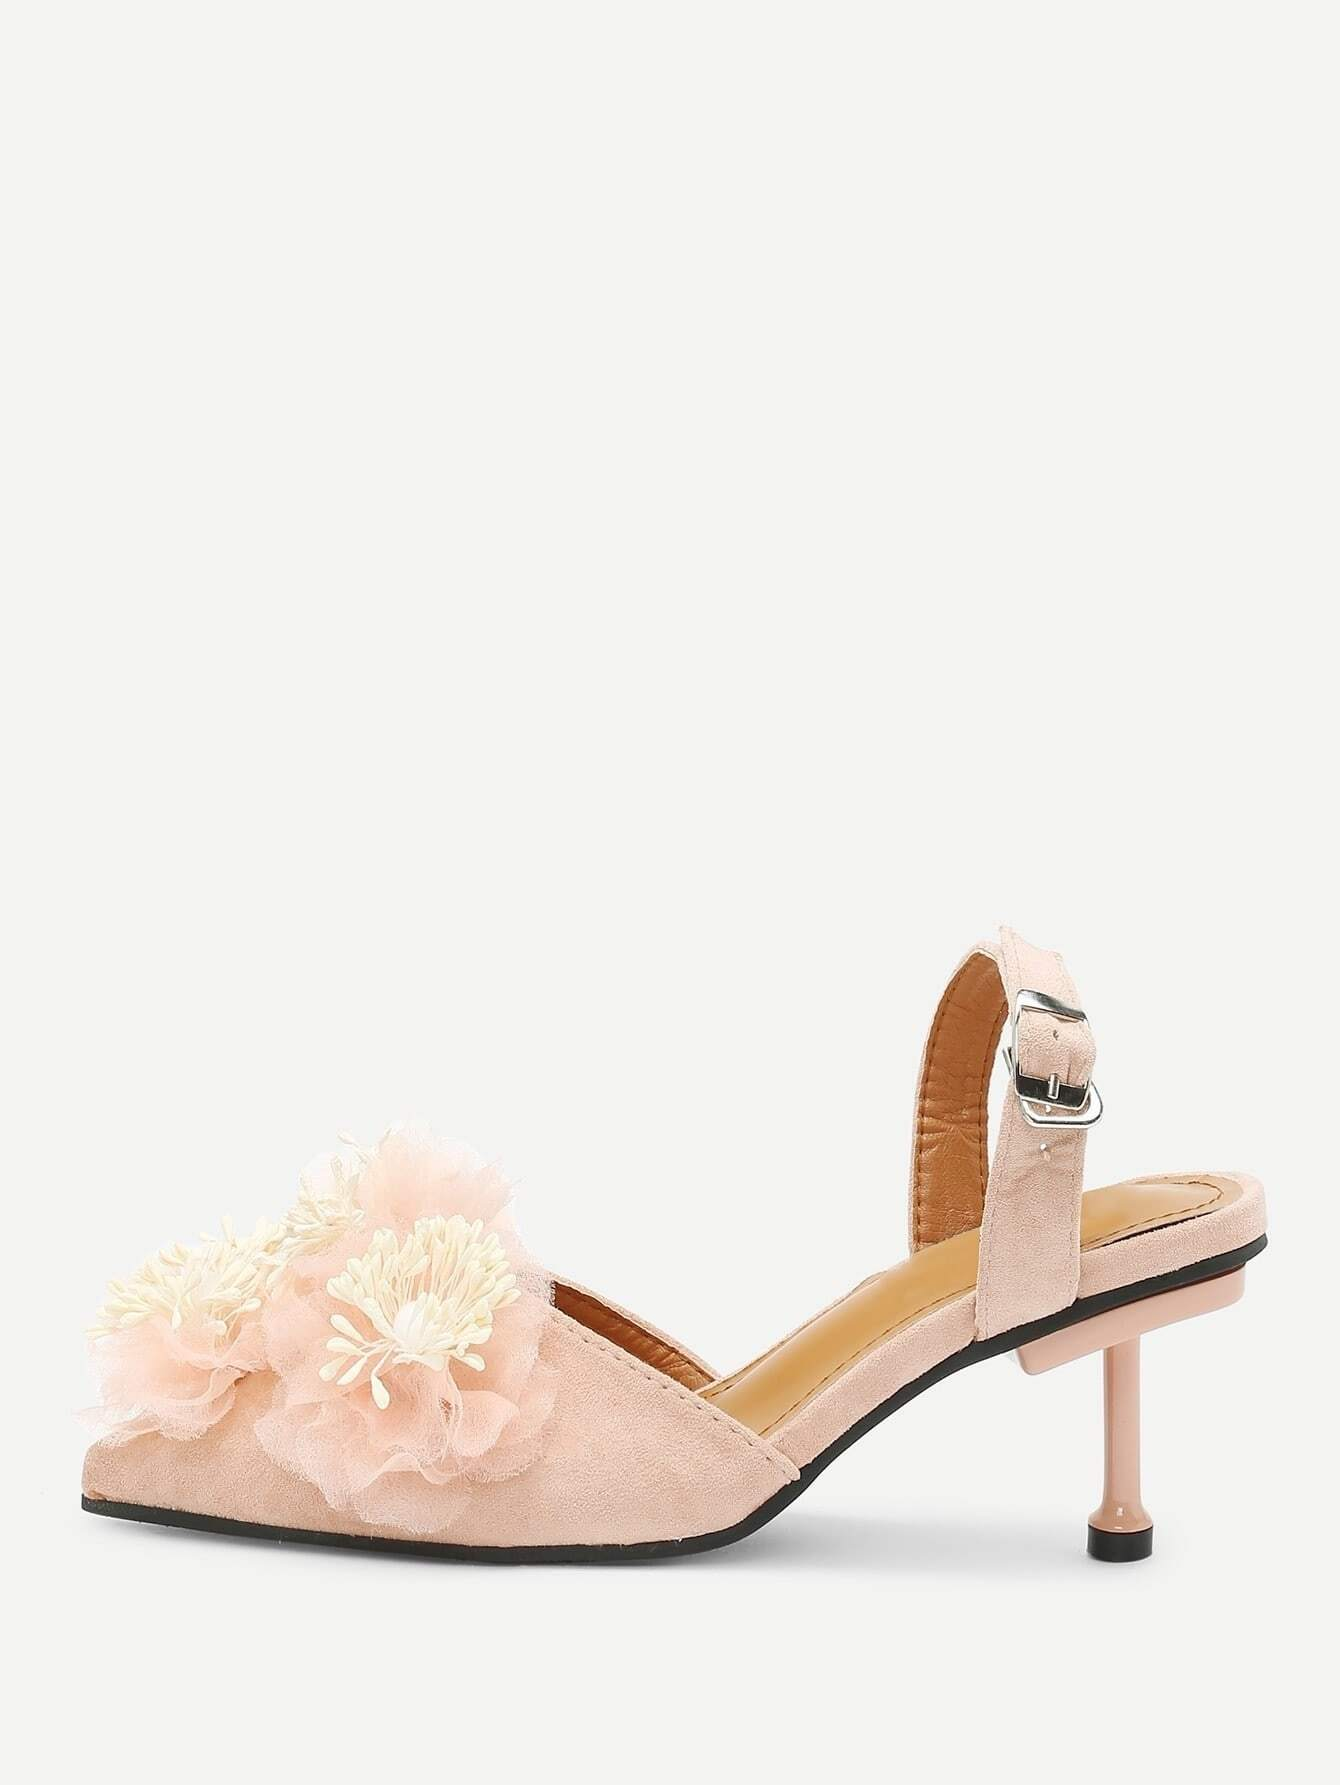 Flower Applique Stiletto Heels printha ellis mary bowen way ahead 5 story аудиокурс cd